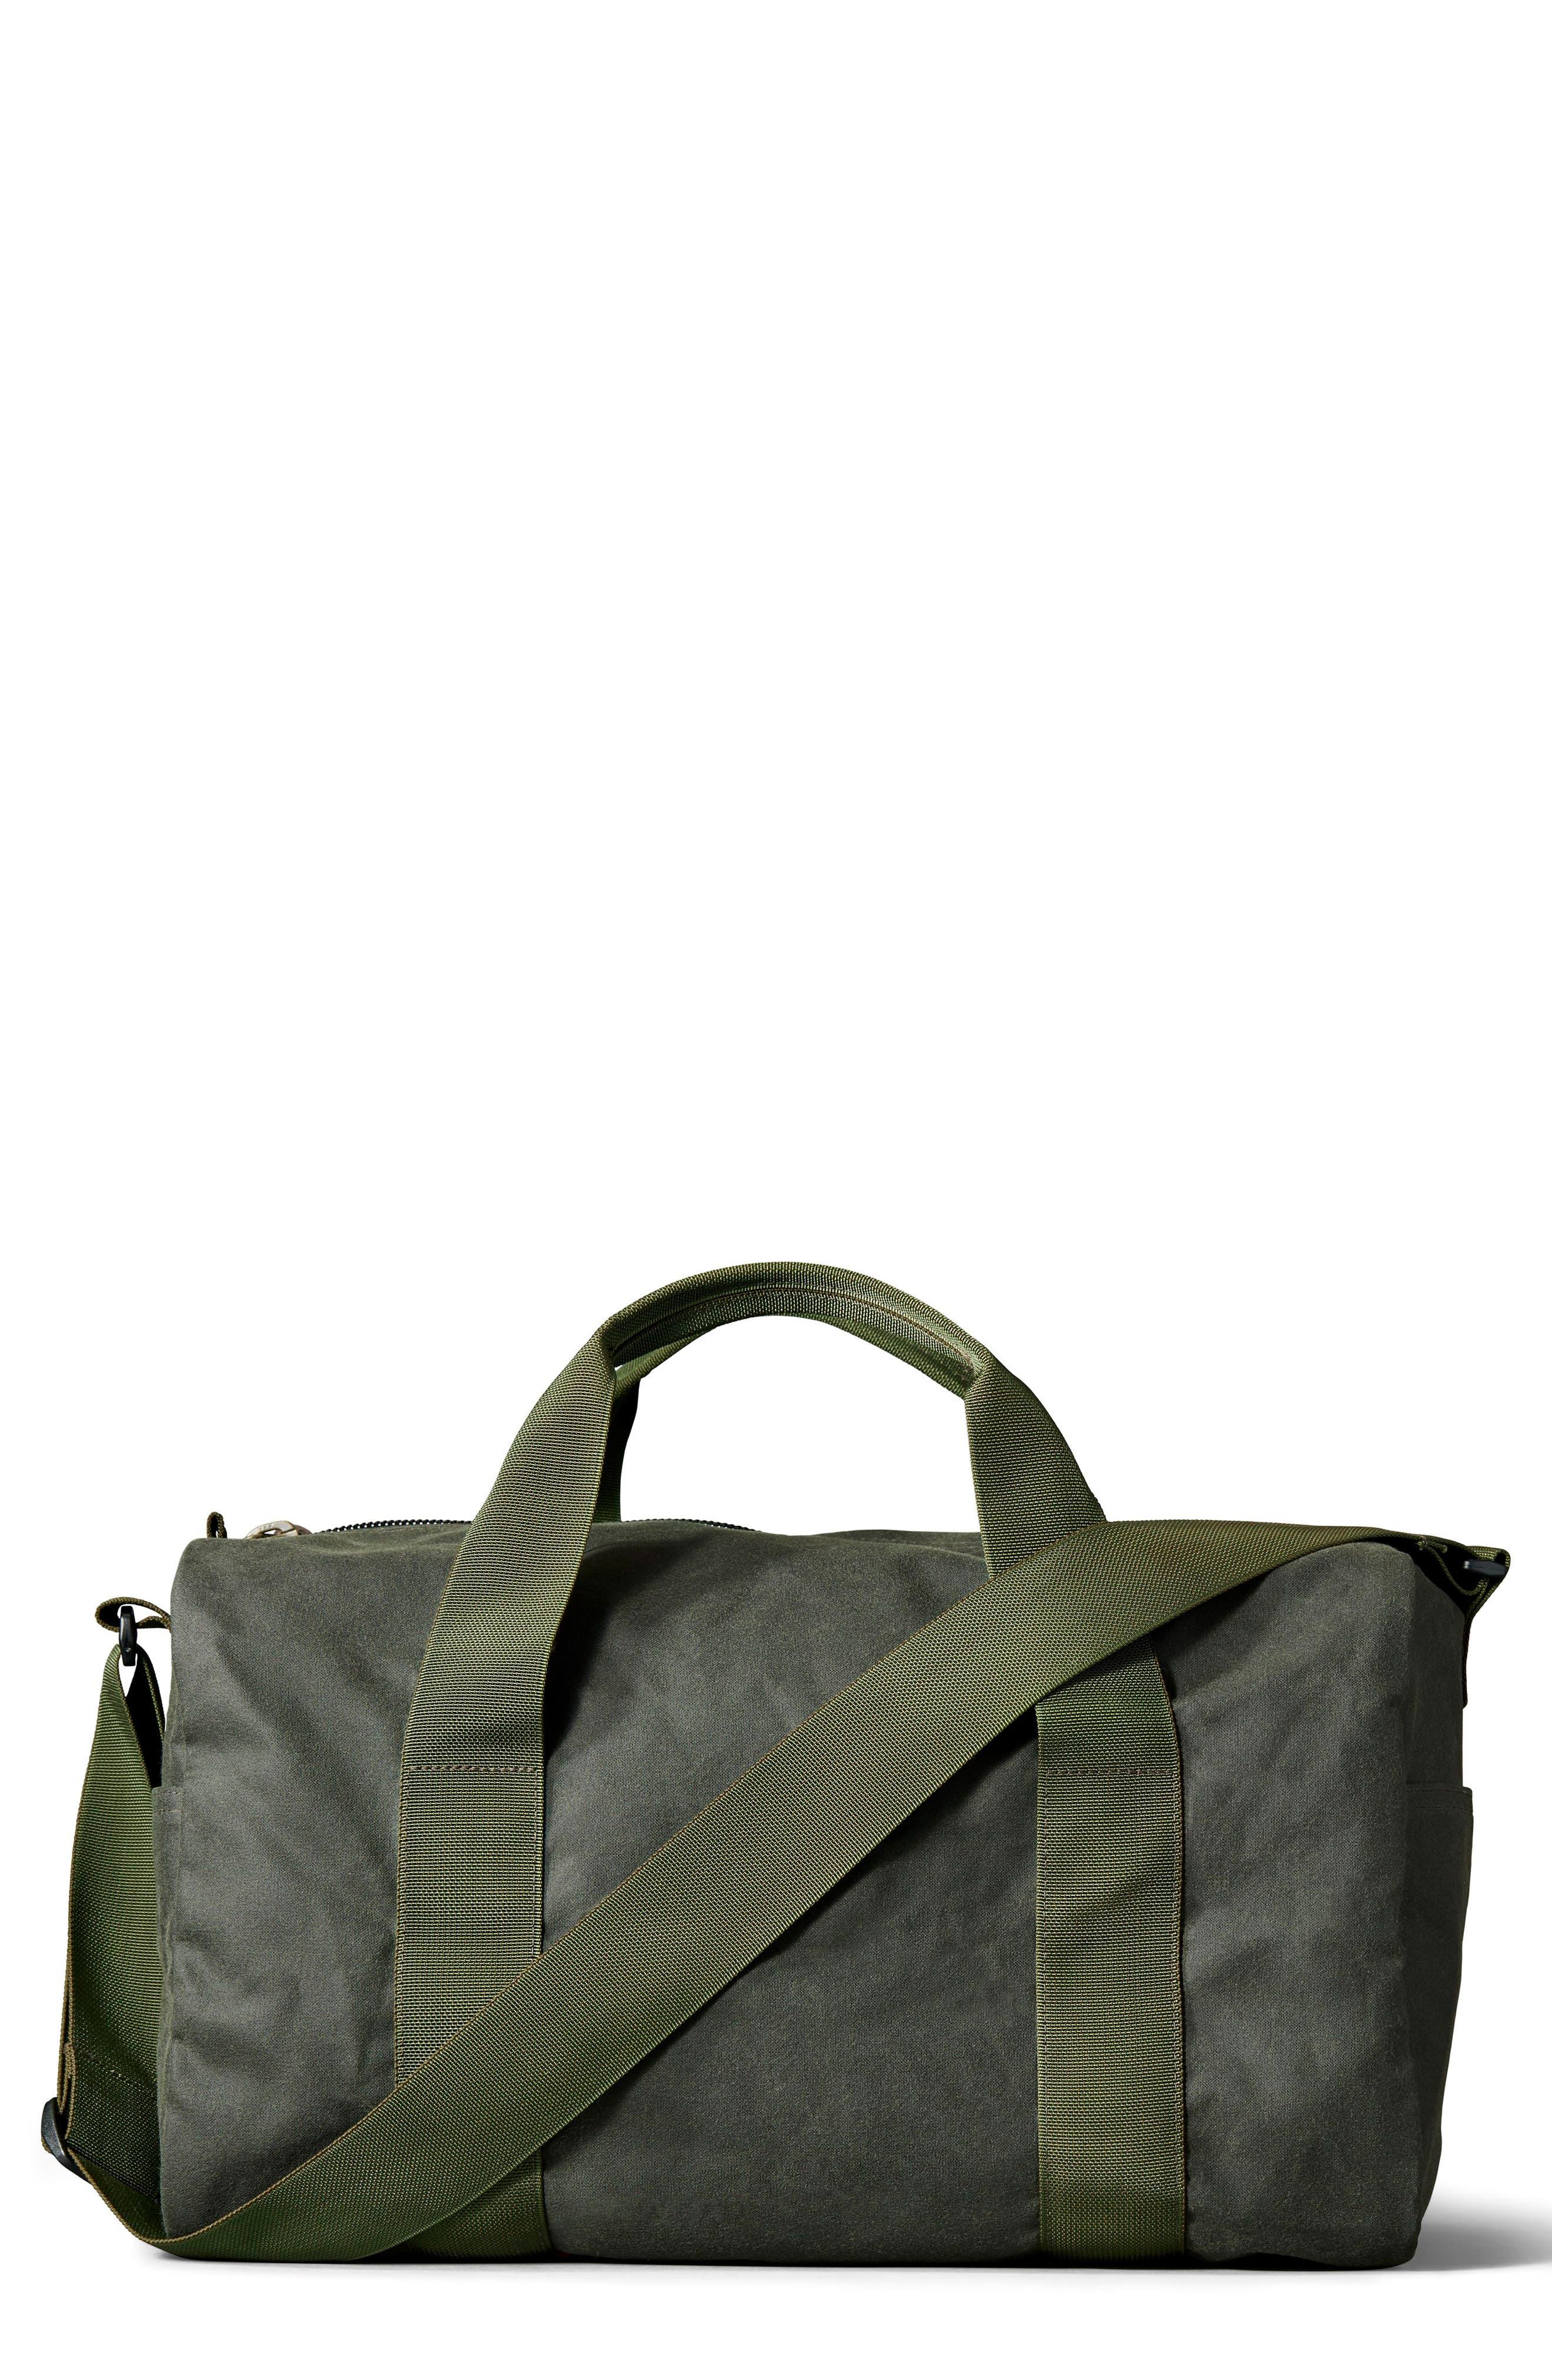 FILSON,                             Medium Field Duffel Bag,                             Main thumbnail 1, color,                             SPRUCE